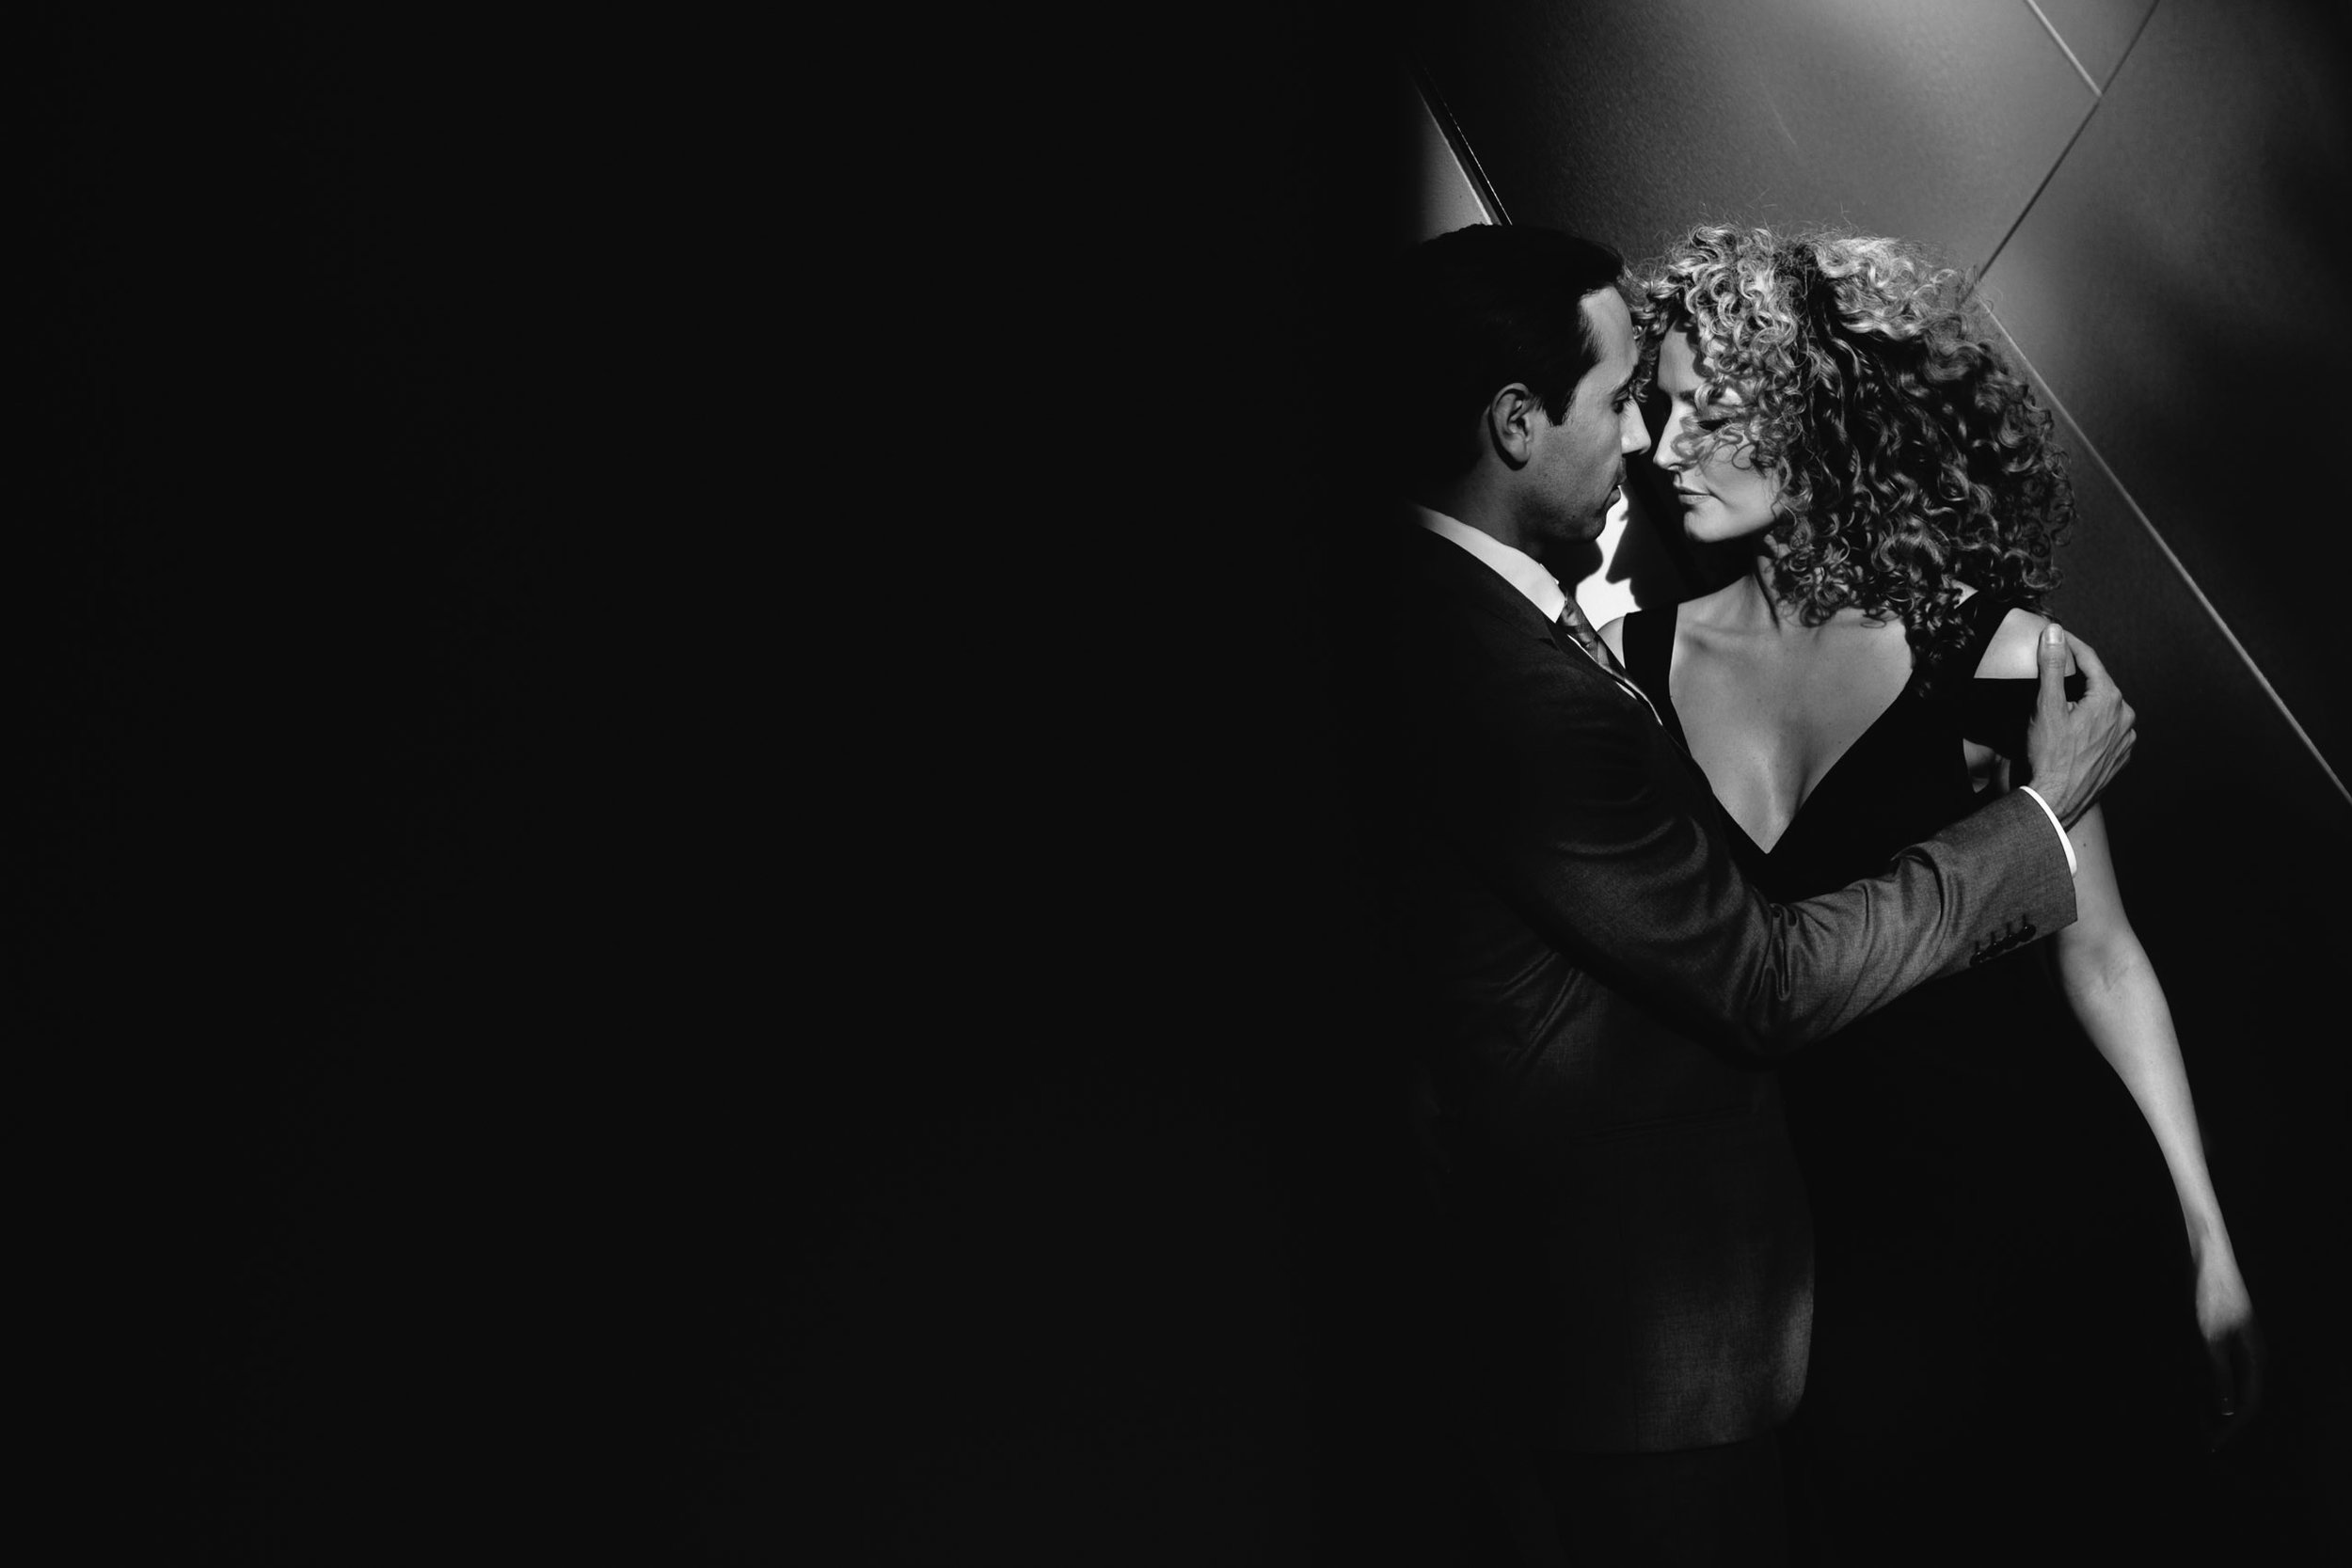 Walt-Disney-Concert-Hall-Engagement.jpg